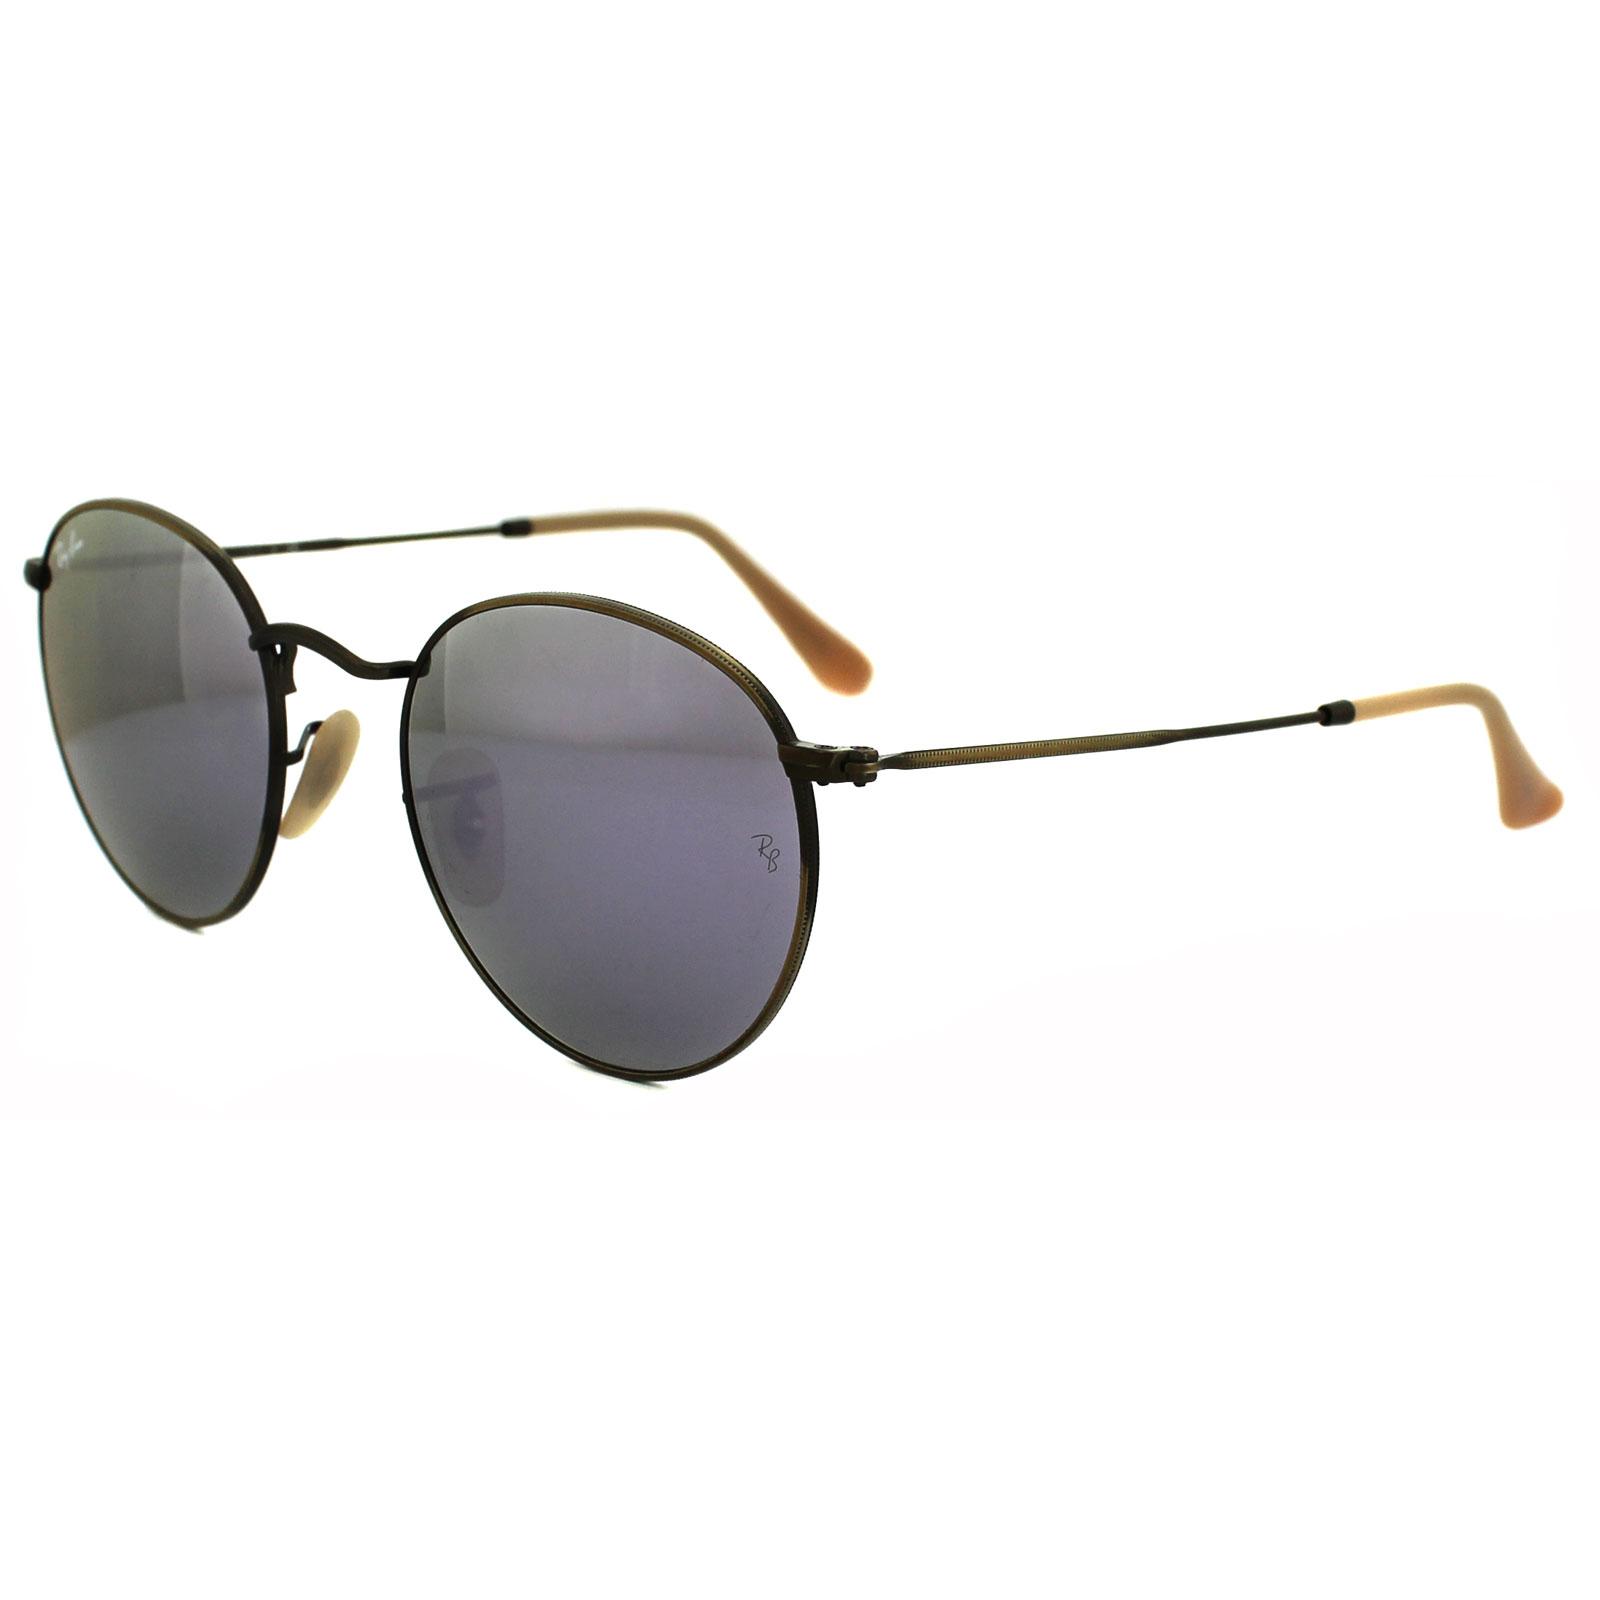 Sentinel Ray-Ban Sunglasses Round Metal 3447 167 4K Bronze Copper Lilac  Mirror 50mm b864d2ca37